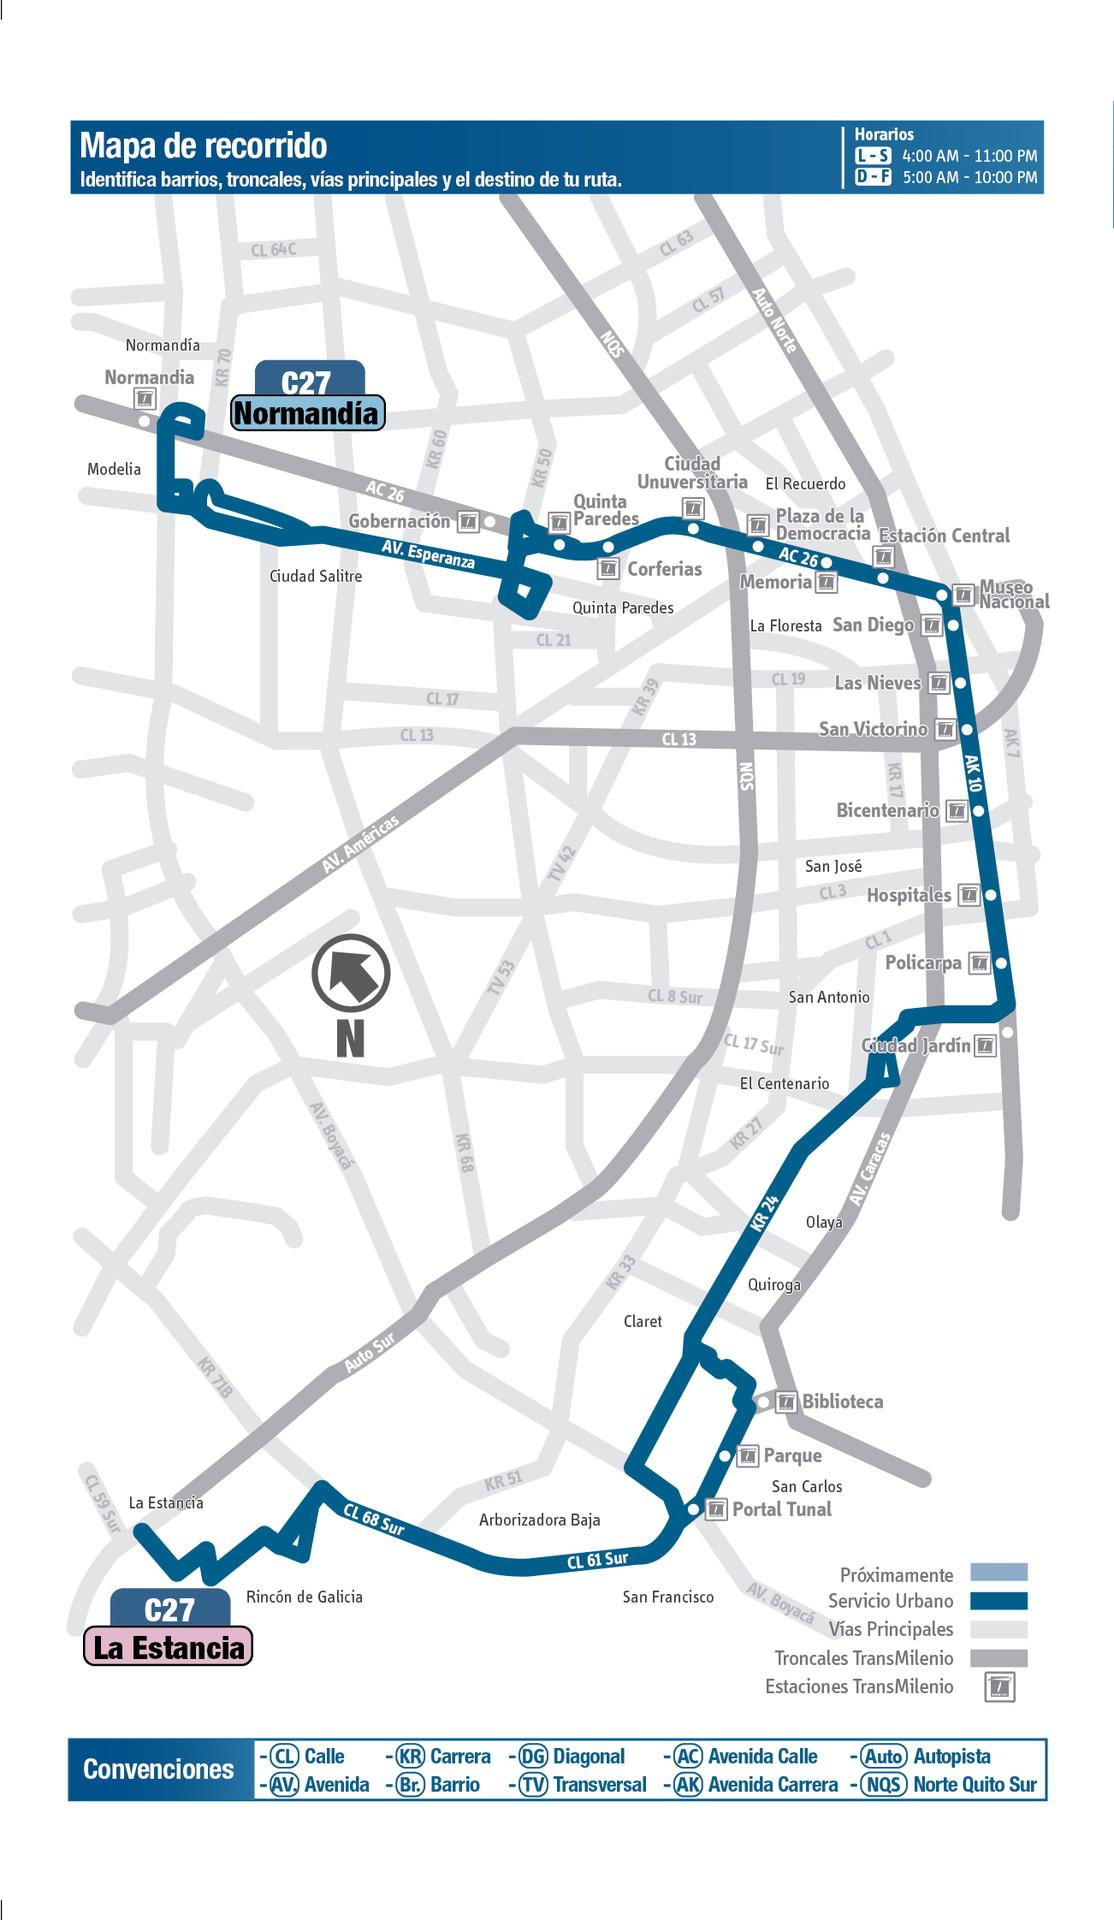 Ruta SITP: C27 La Estancia ↔ Normandía [Urbana] 1